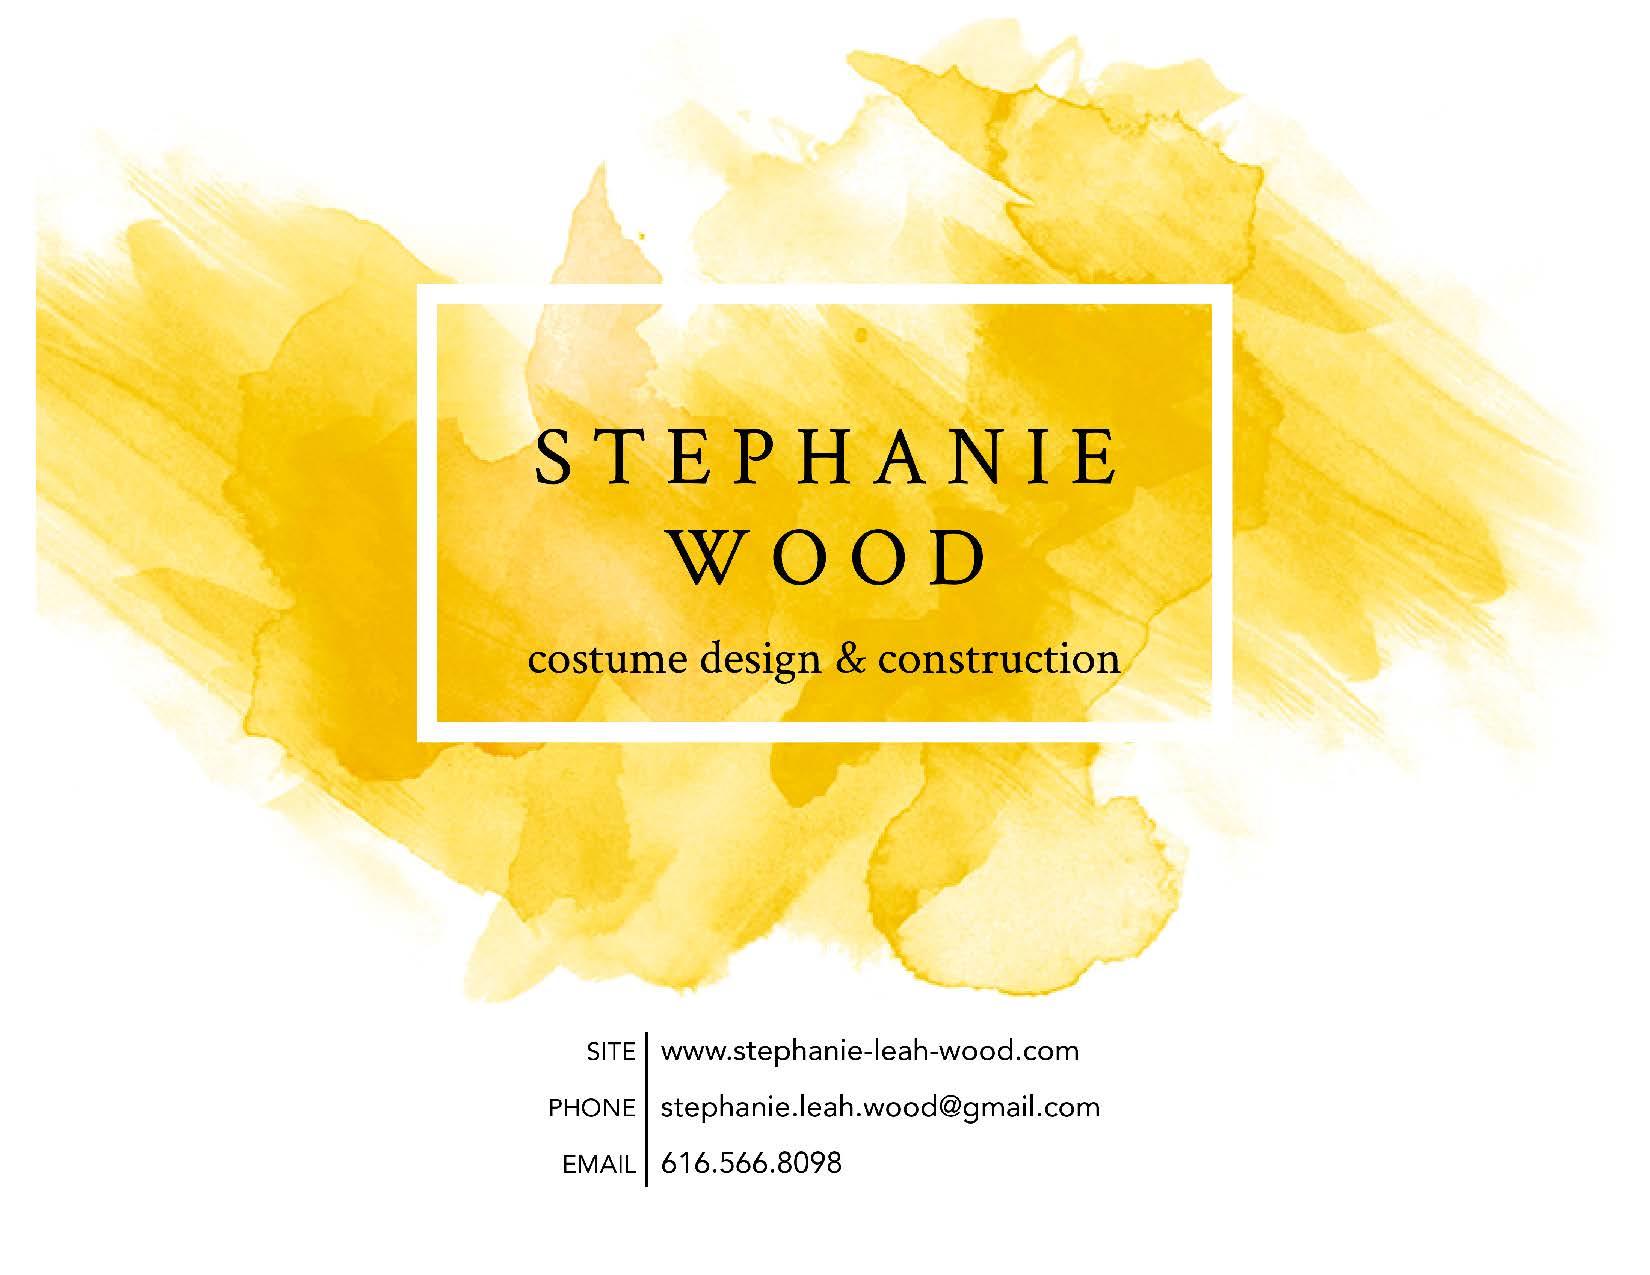 StephanieWood_MFA_FSH_Costume Design_Page_01.jpg